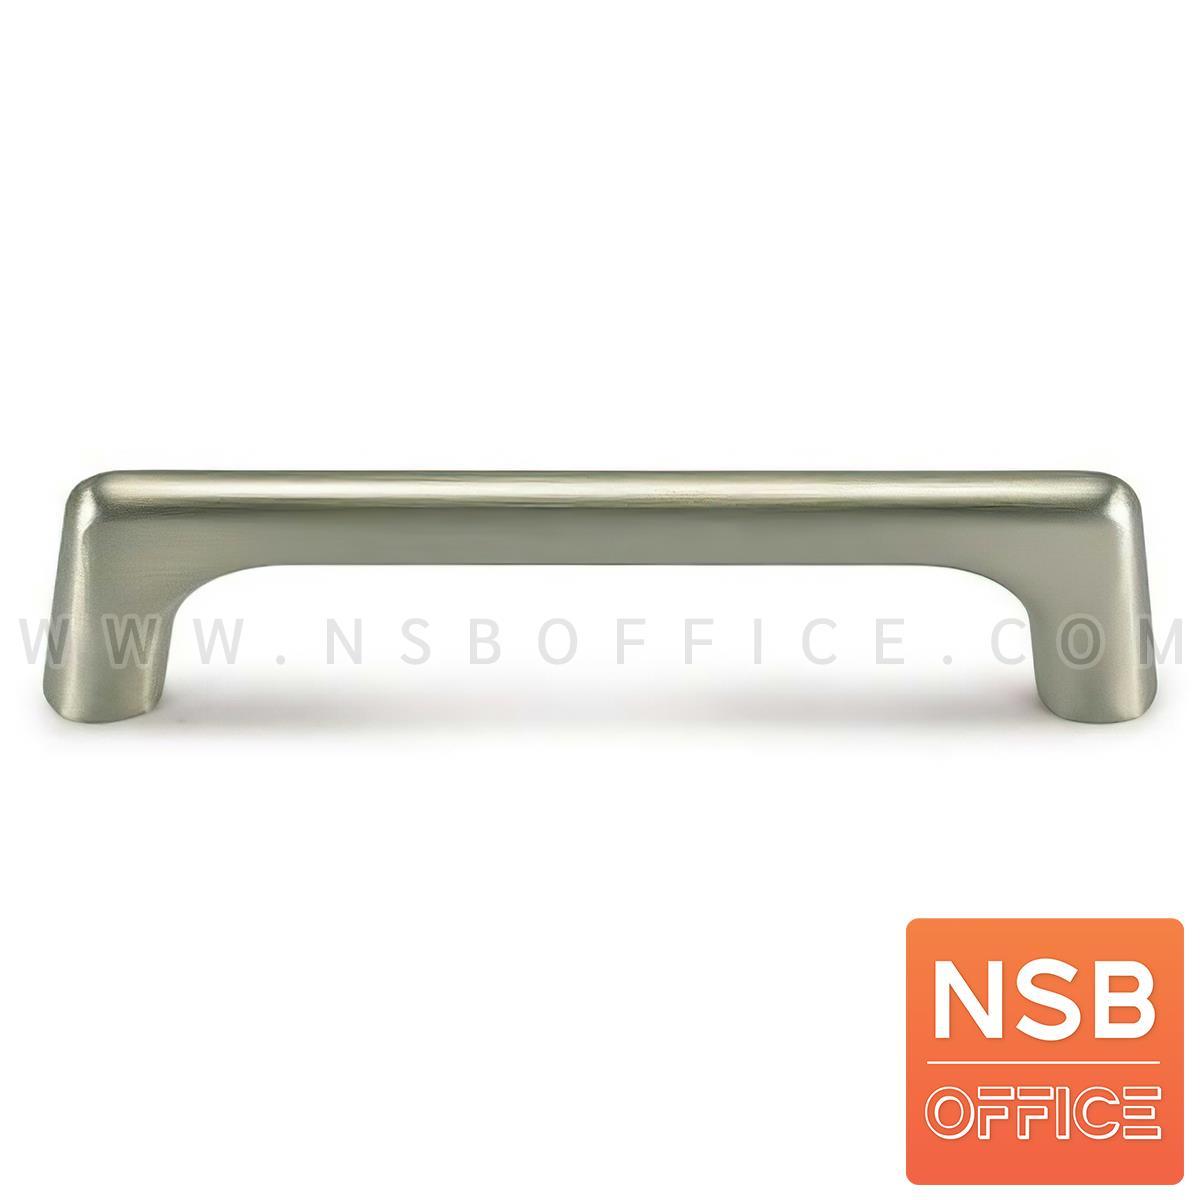 J01A021:มือจับซิงค์อัลลอยด์ รุ่น NSB-HAND 5